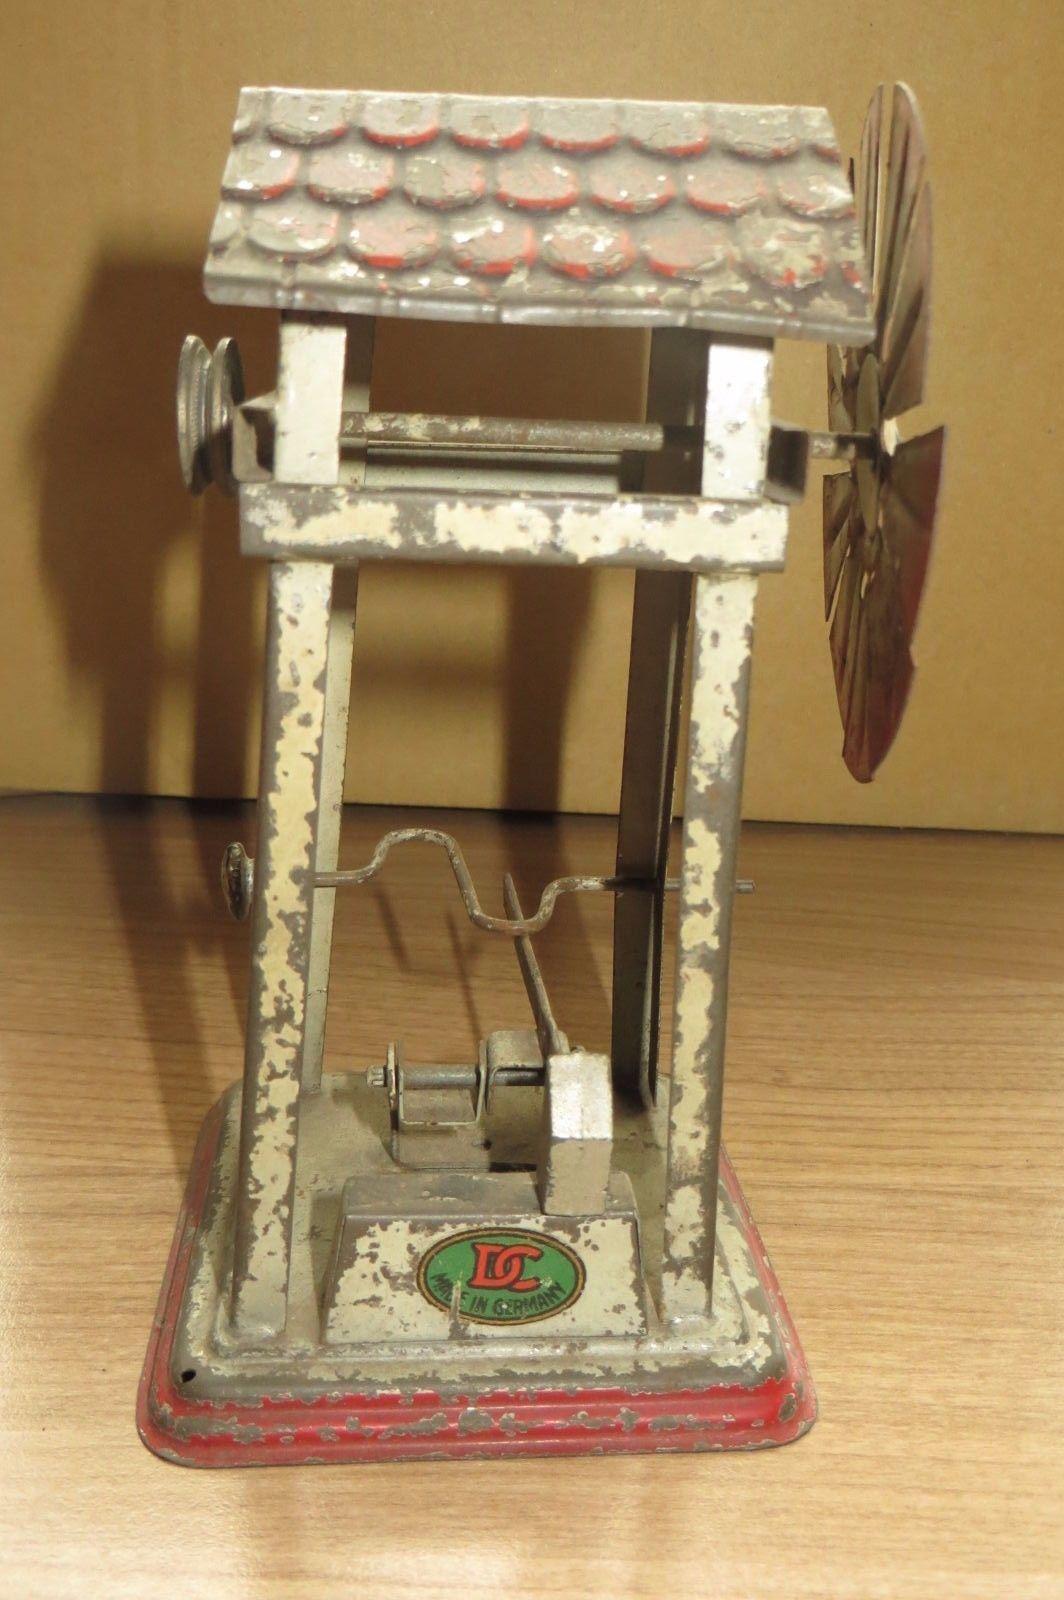 accessoire machine vapeur doll no bing ebay jouets pinterest. Black Bedroom Furniture Sets. Home Design Ideas